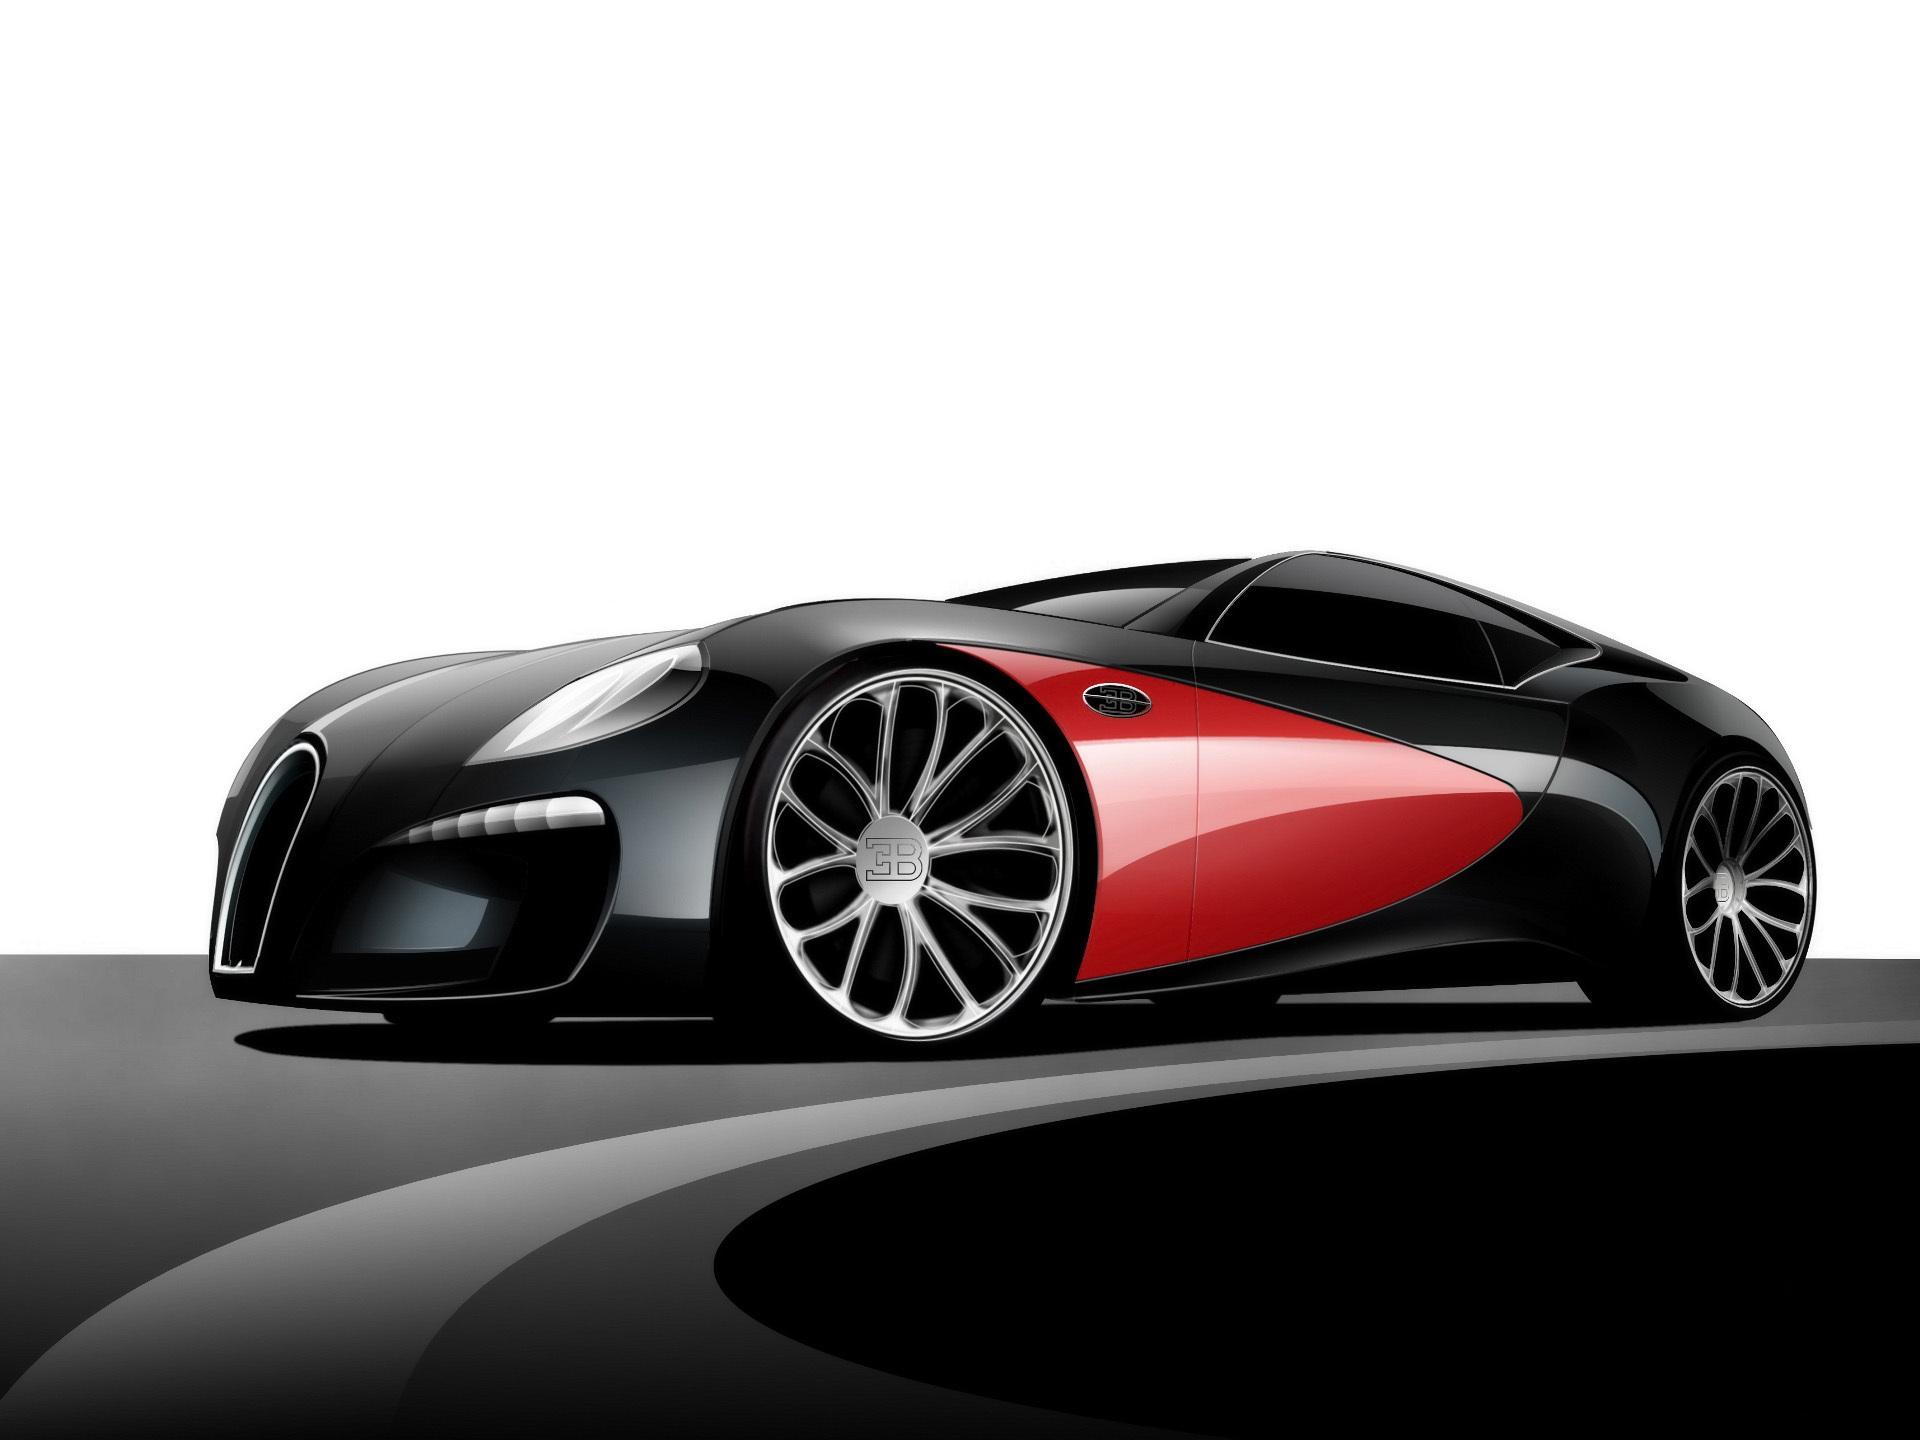 Download Cars Desktop Backgrounds 195   Fullsize Wallpaper 1920x1440